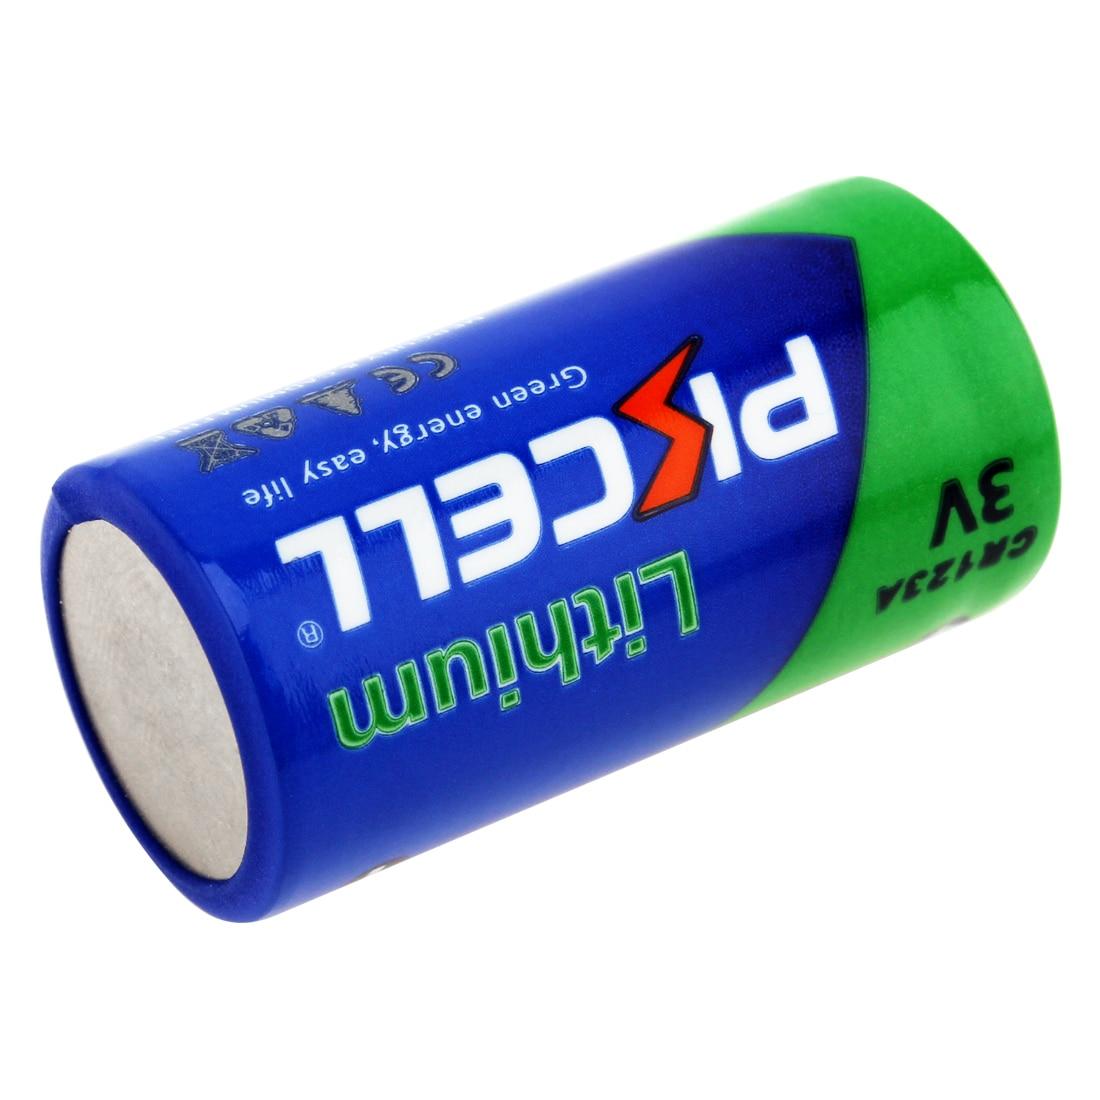 Baterias Secas 2 x cr17345 cr123a cr123a Marca : Pkcell